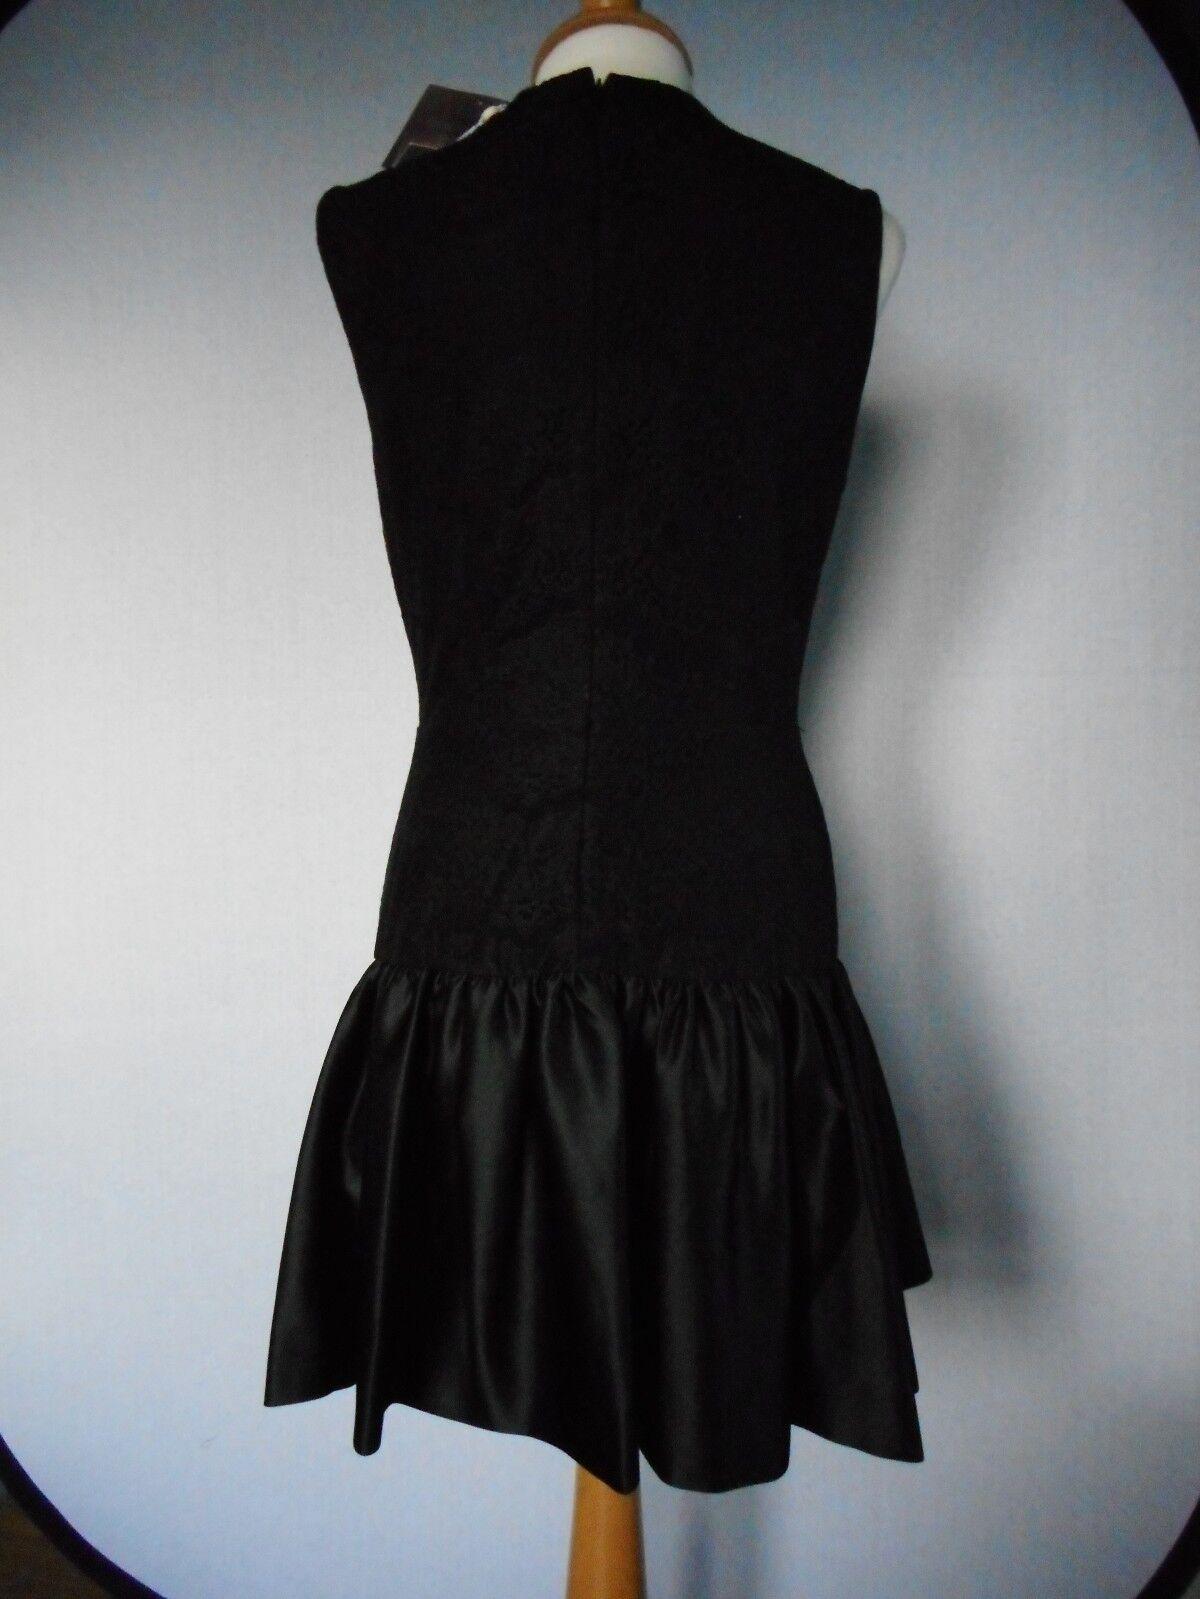 ERIN para mujer Vestido talla talla talla 8 Nuevo con etiquetas PVP 295 - 87f21d